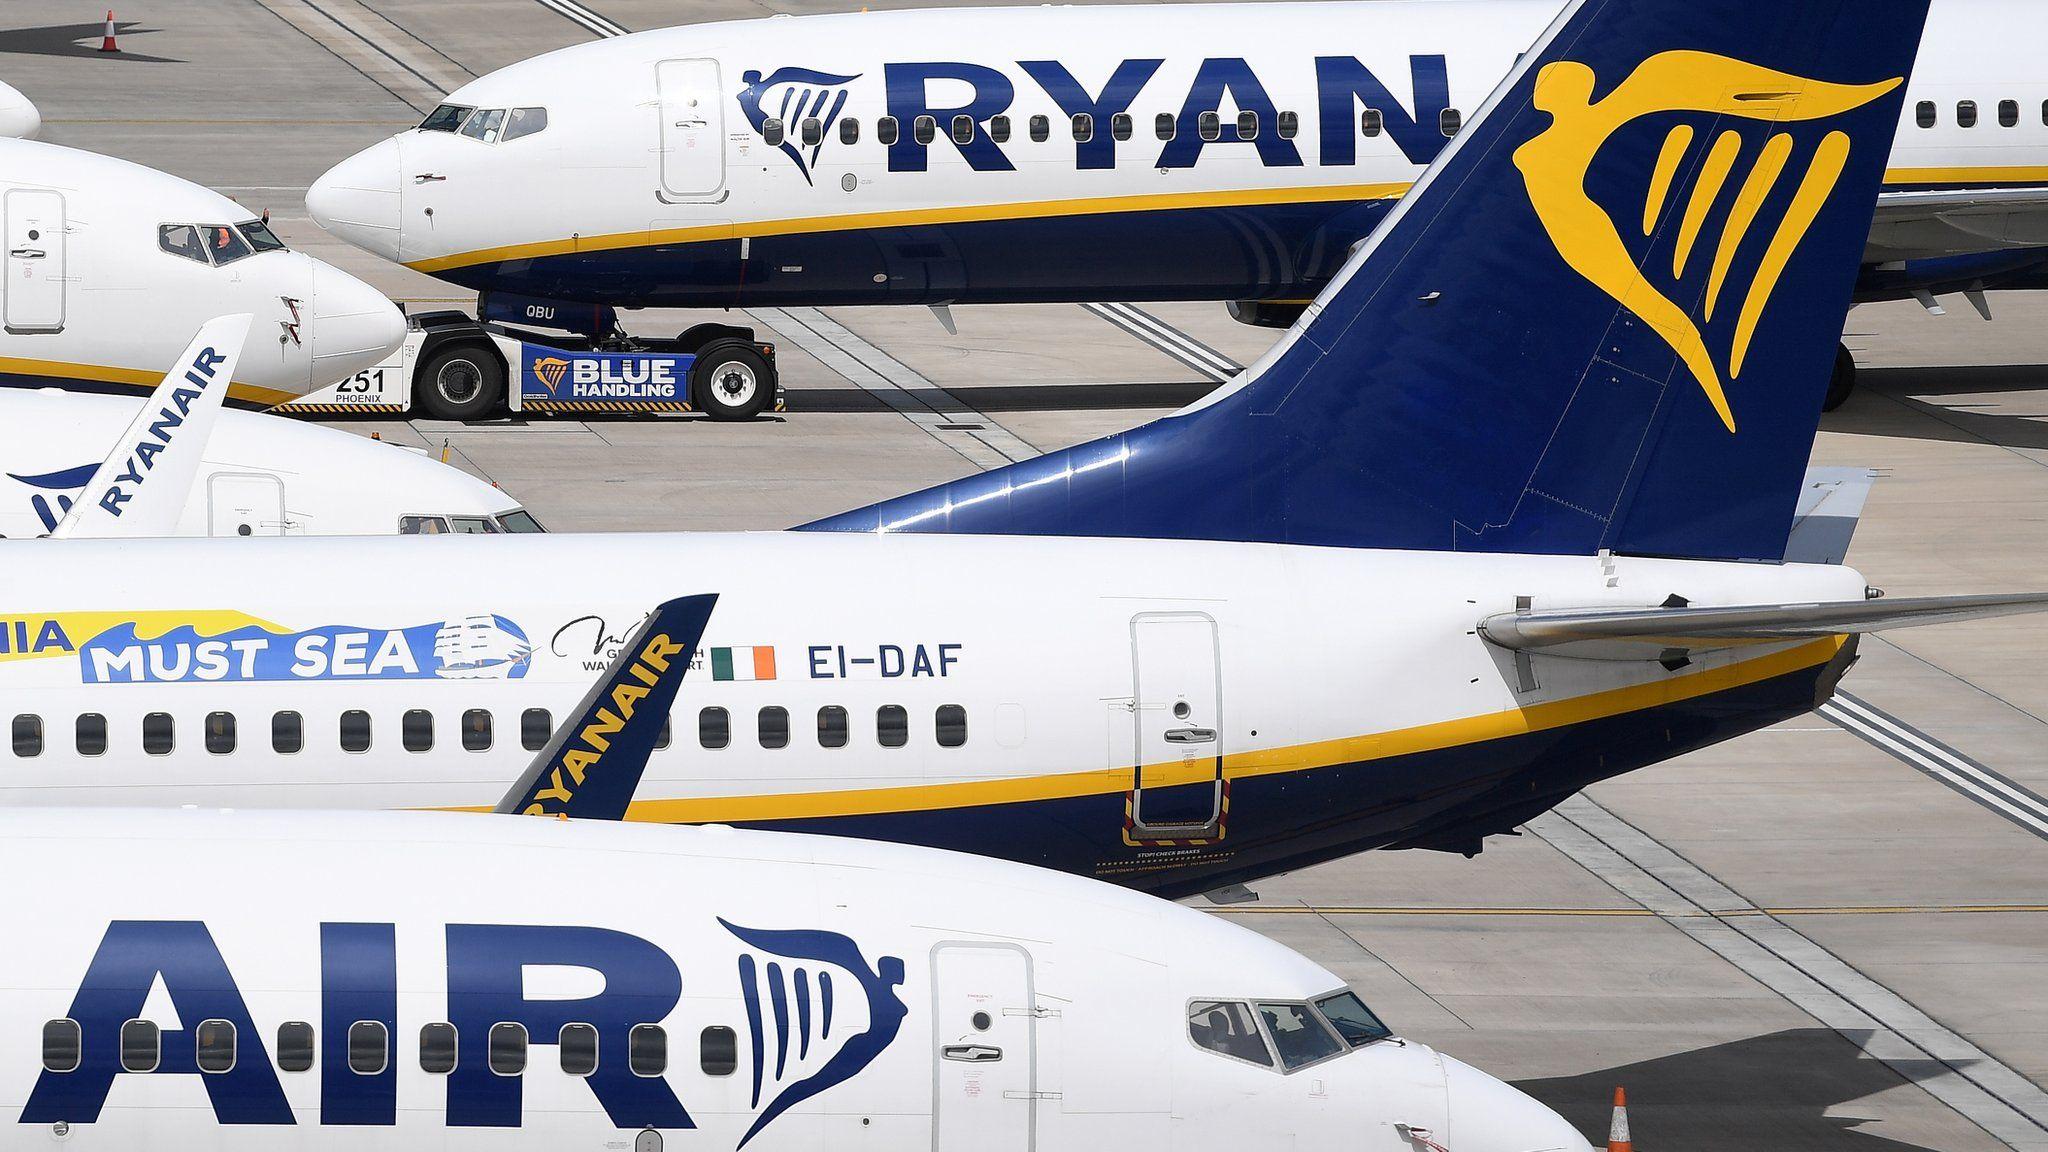 Ryanair still flying to Spain despite quarantine - BBC News